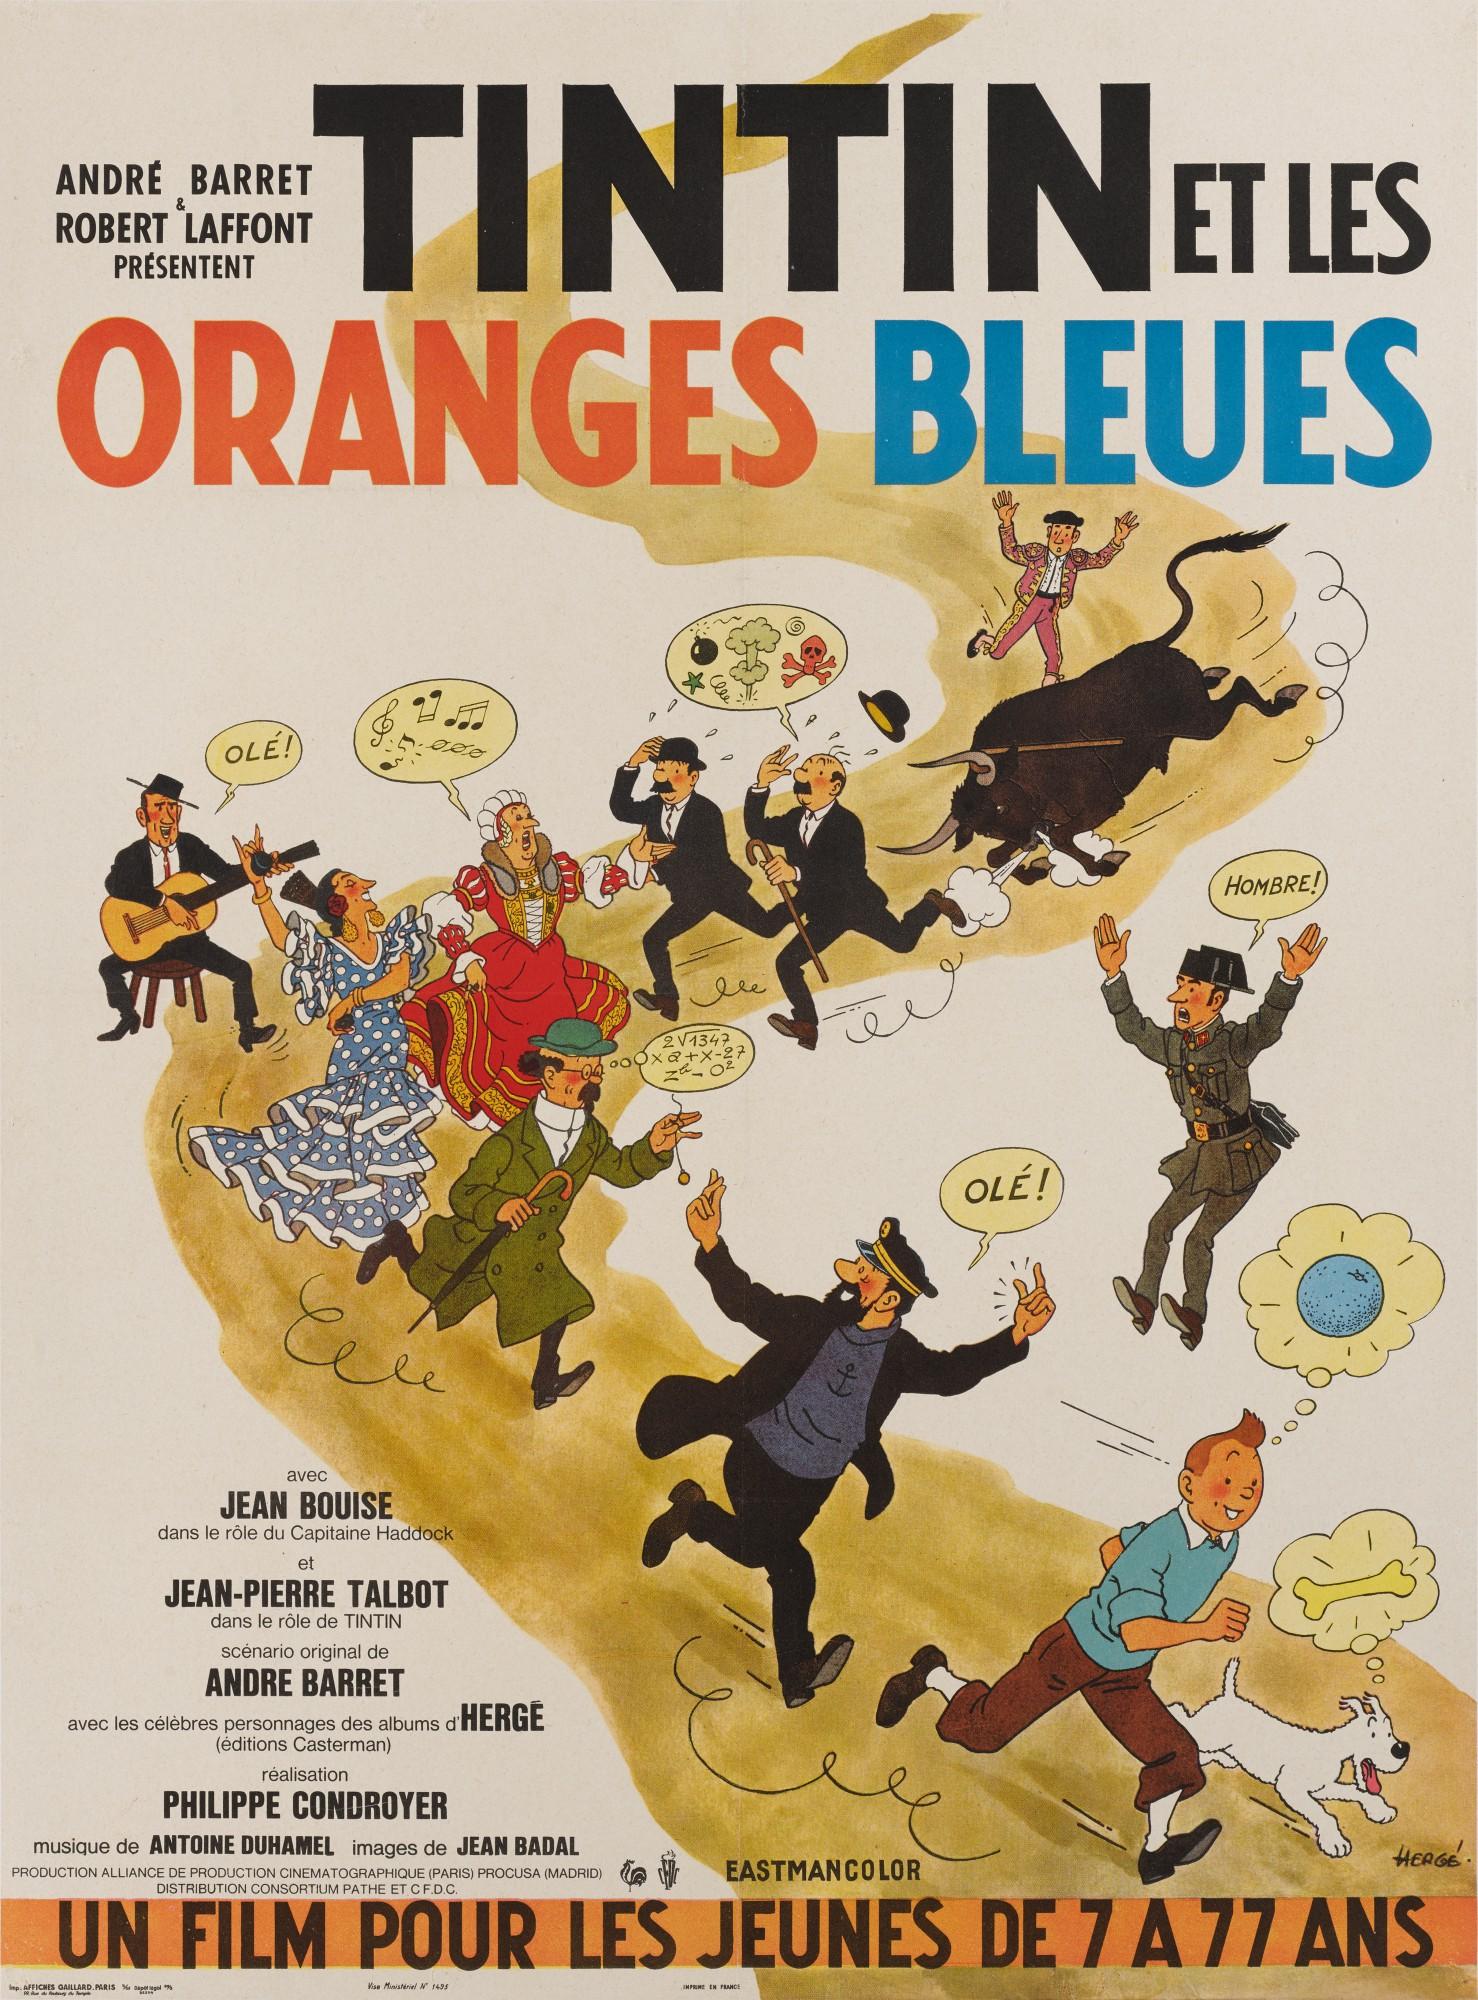 TINTIN ET LES ORANGES BLEUES (1964) POSTER, FRENCH